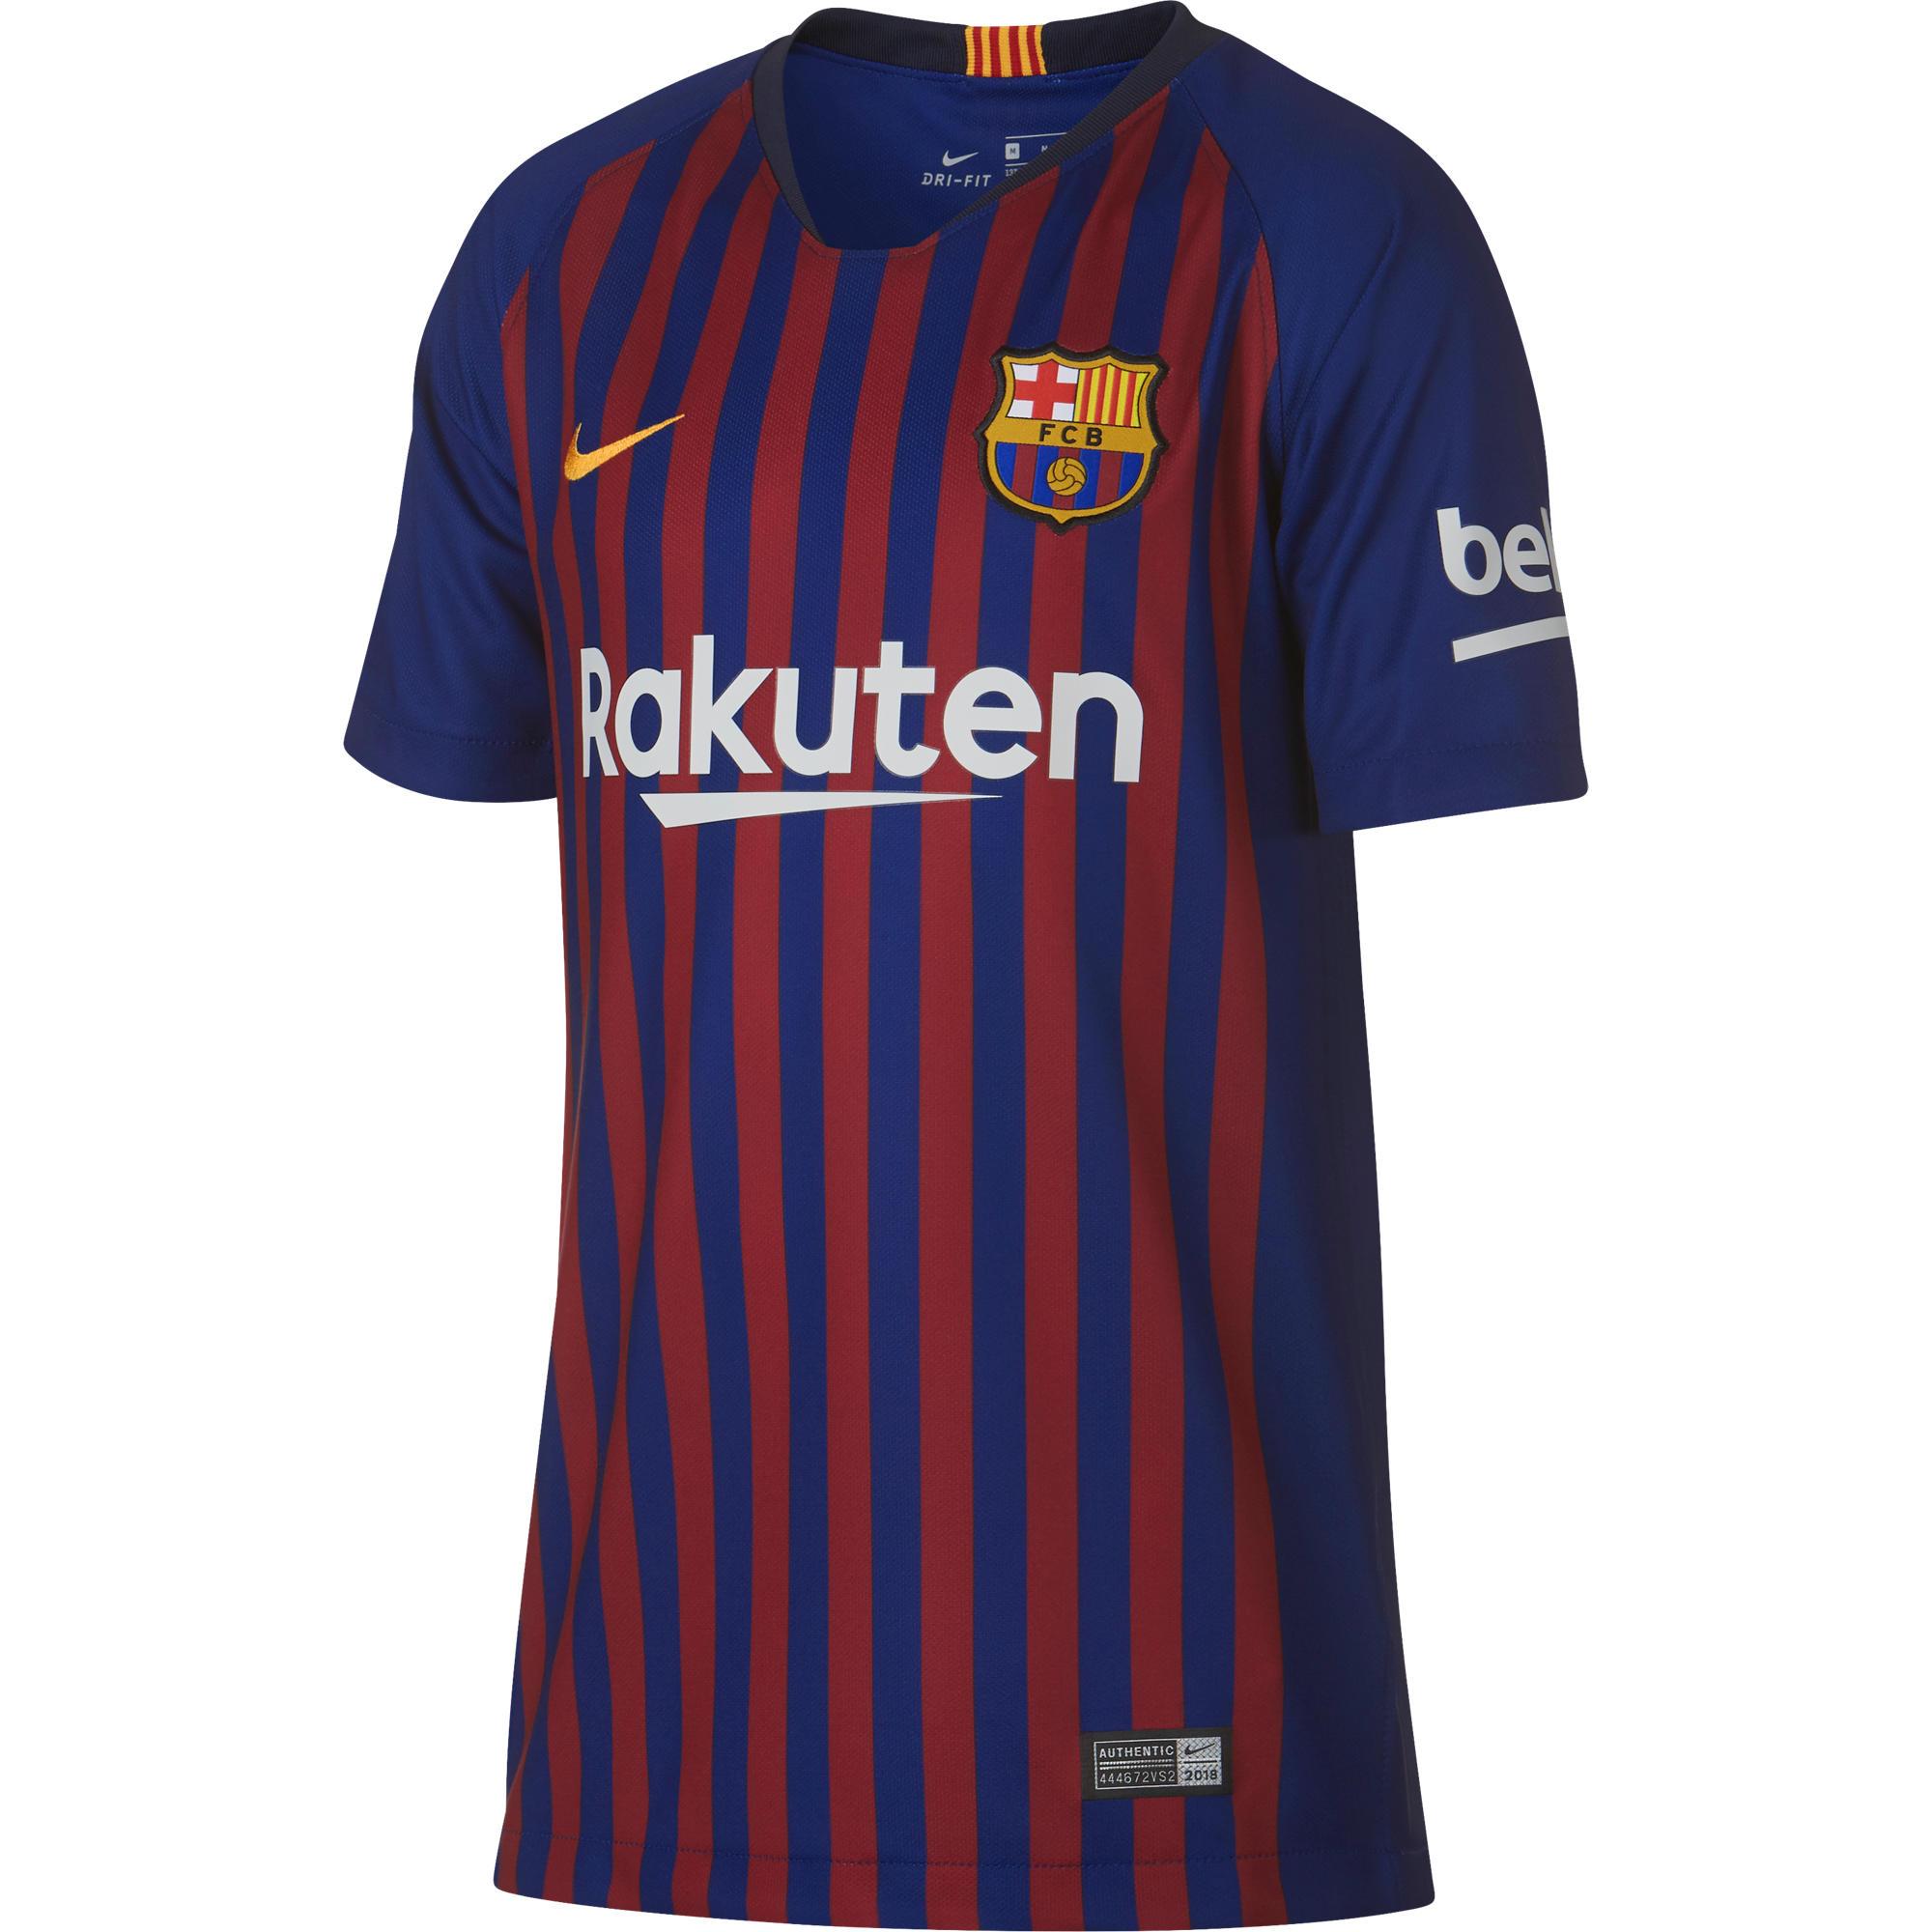 Camiseta de Fútbol Nike oficial F.C. Barcelona 1ª equipación niños 2018 19 ebe006659f6